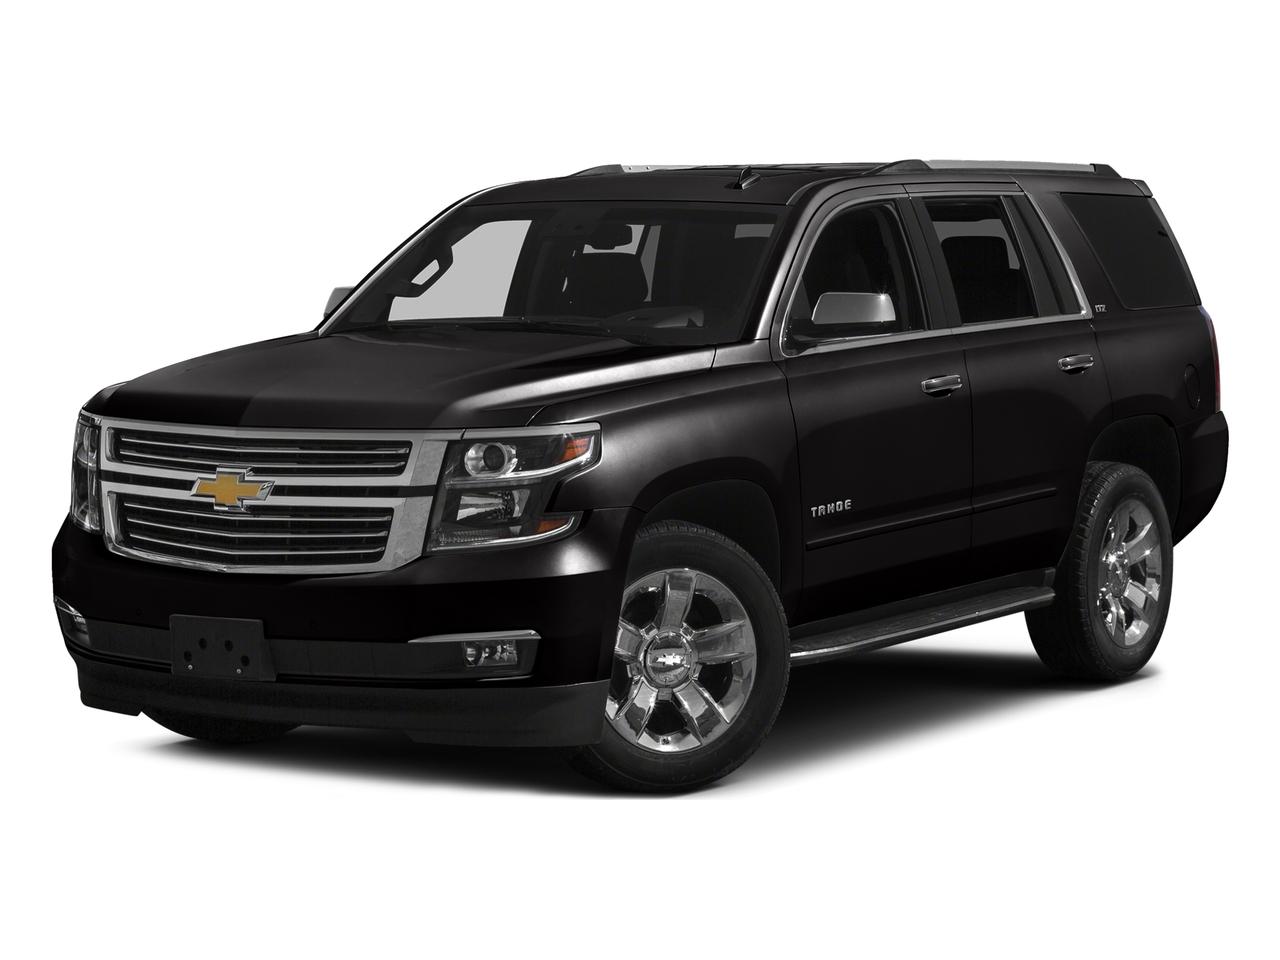 Black 2016 Chevrolet Tahoe LTZ SUV Wake Forest NC